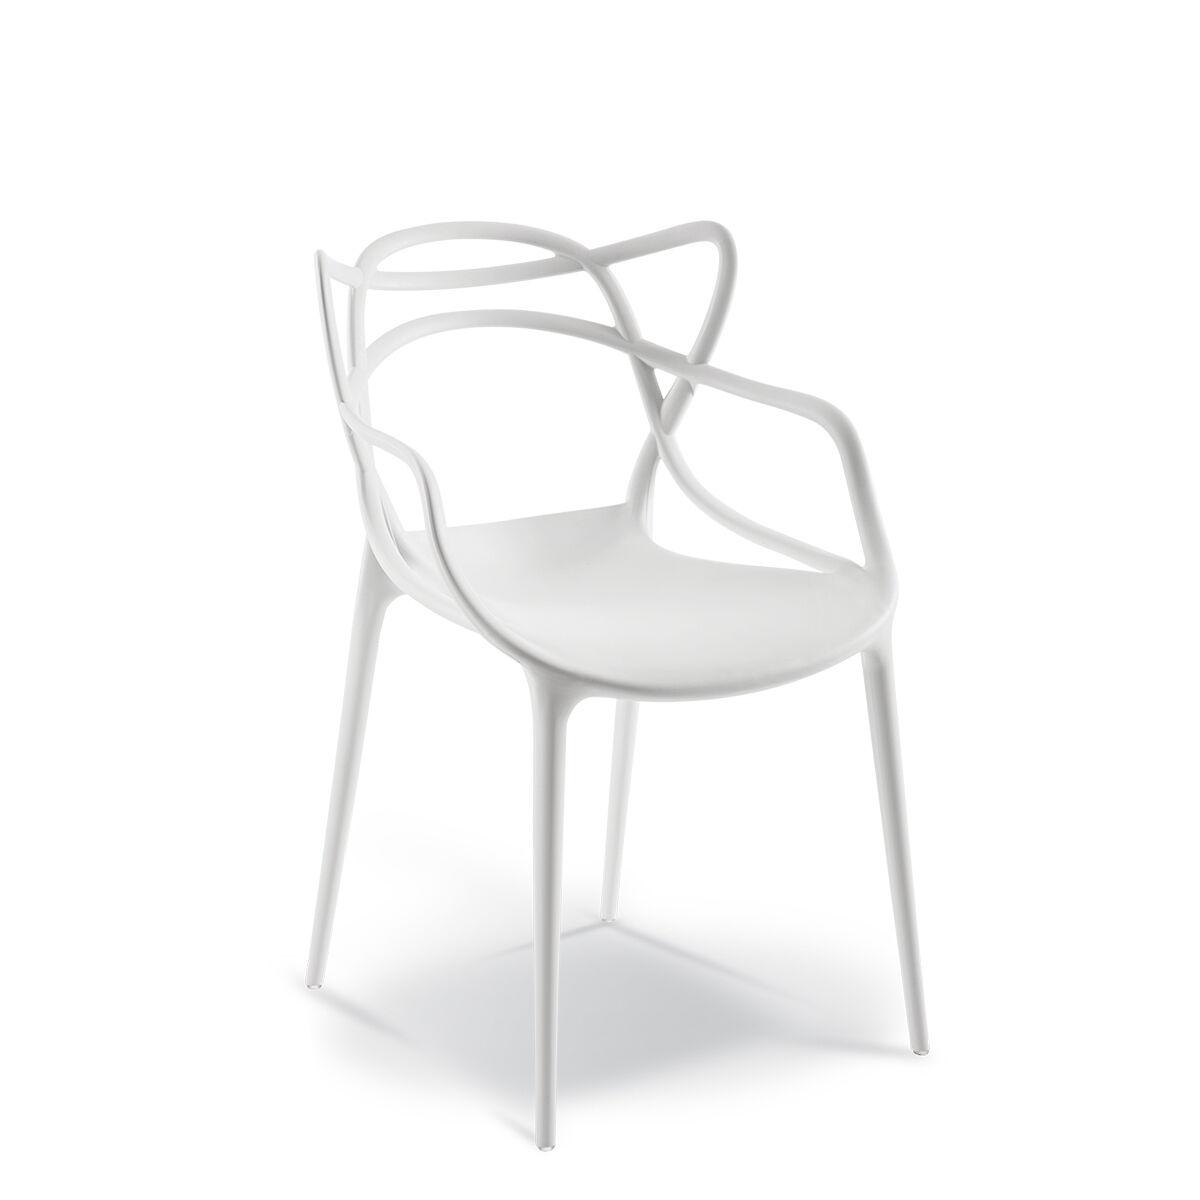 Scribble Armchair Tabletops Furniture